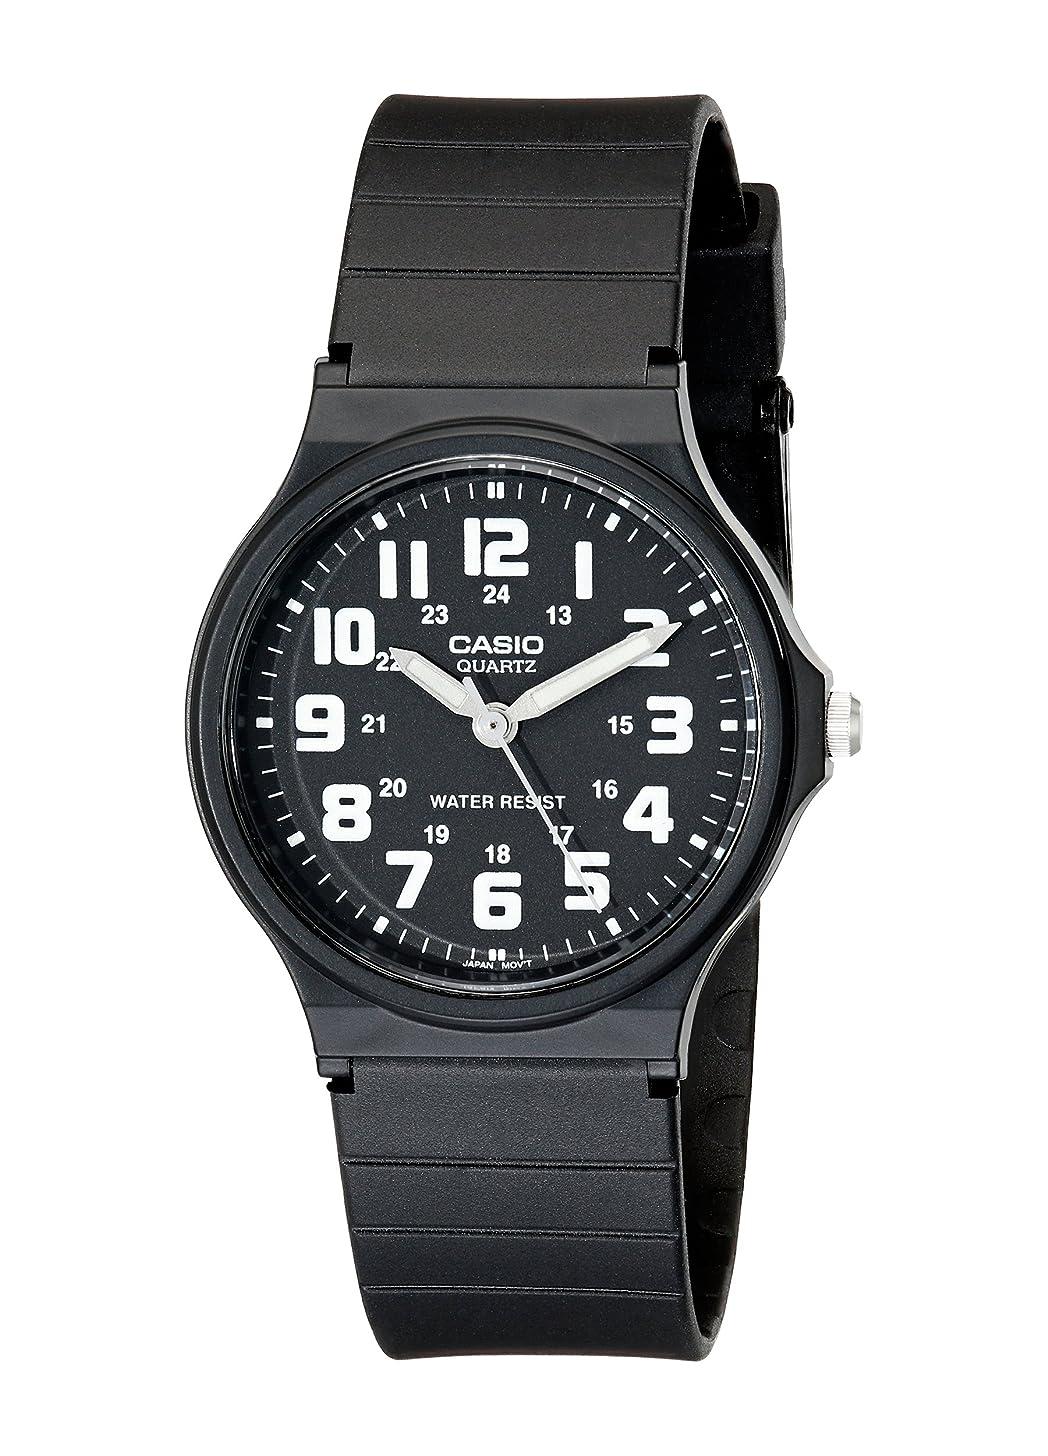 Casio Unisex MQ-71-1BCF Classic Luminous Hands Watch With Black Resin Band